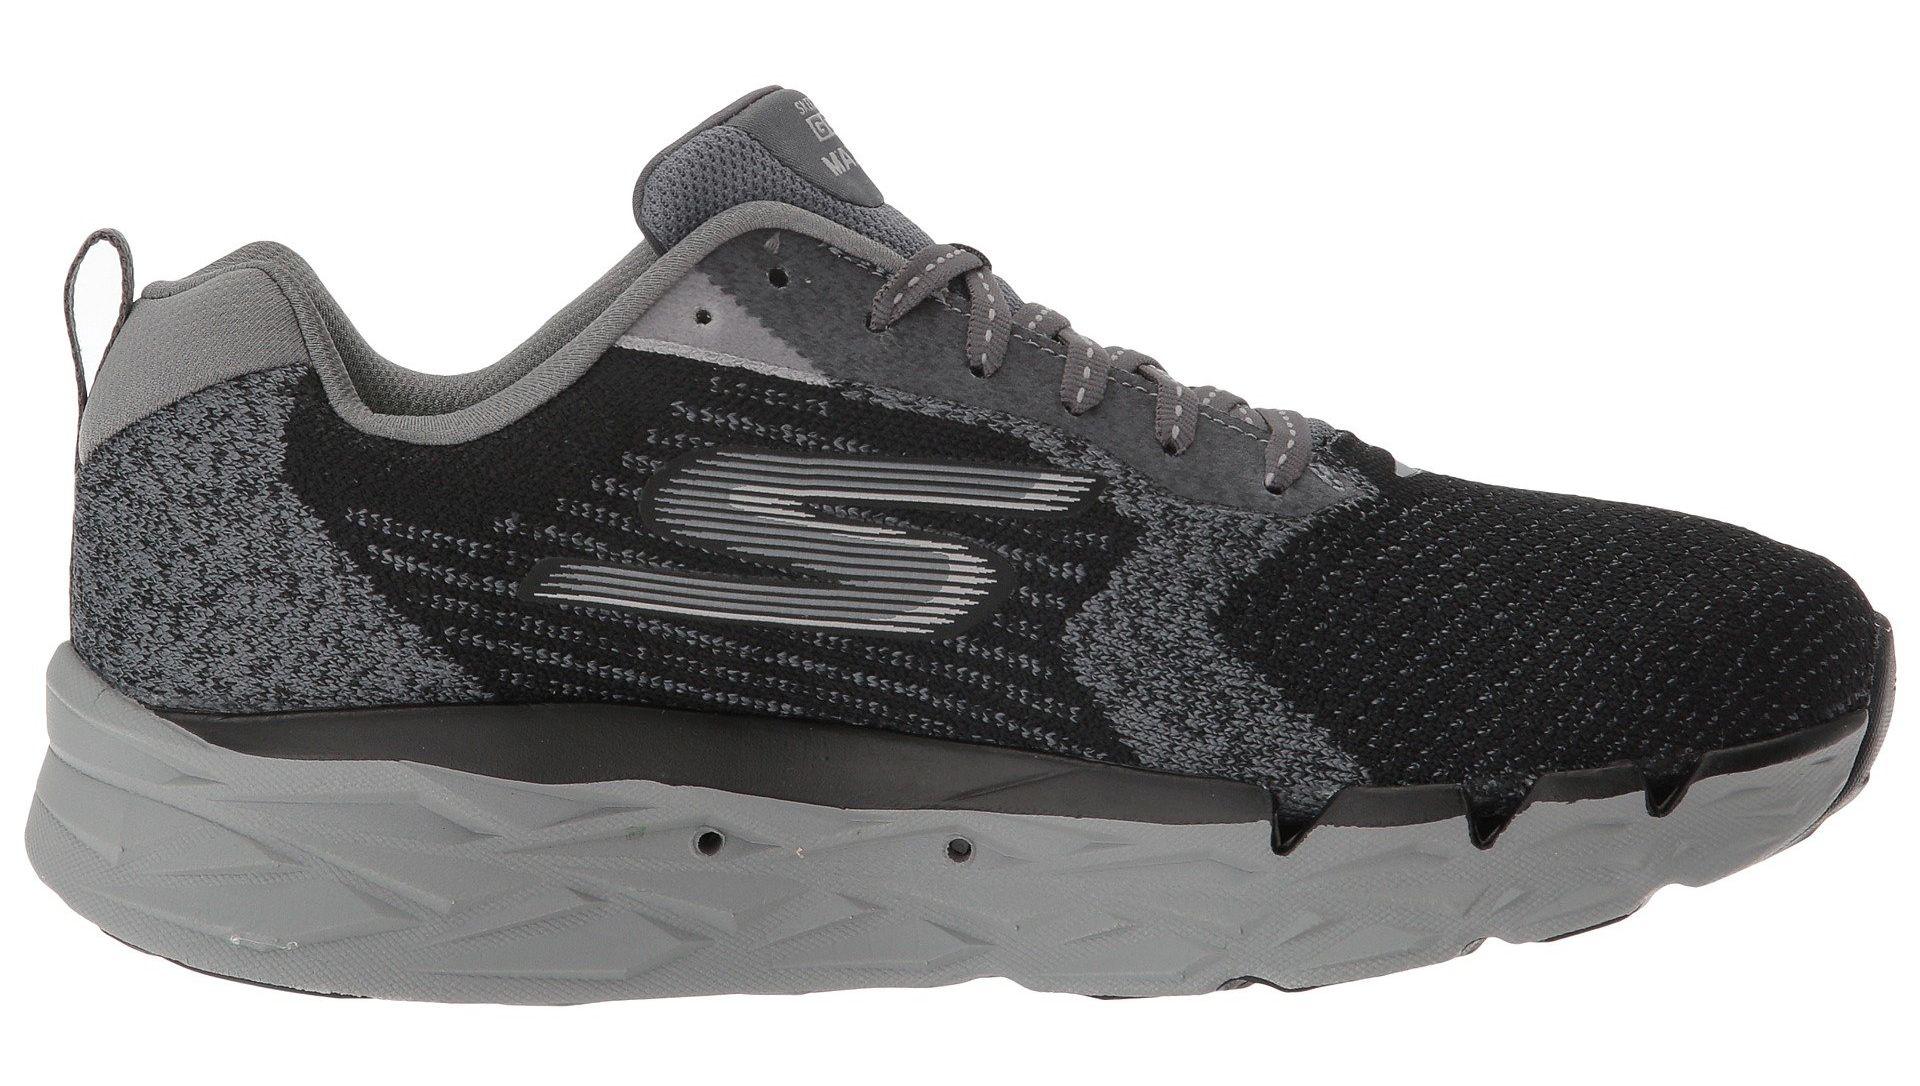 520fdd50a2b Skechers Running Shoes   Best Skechers Shoes 2019